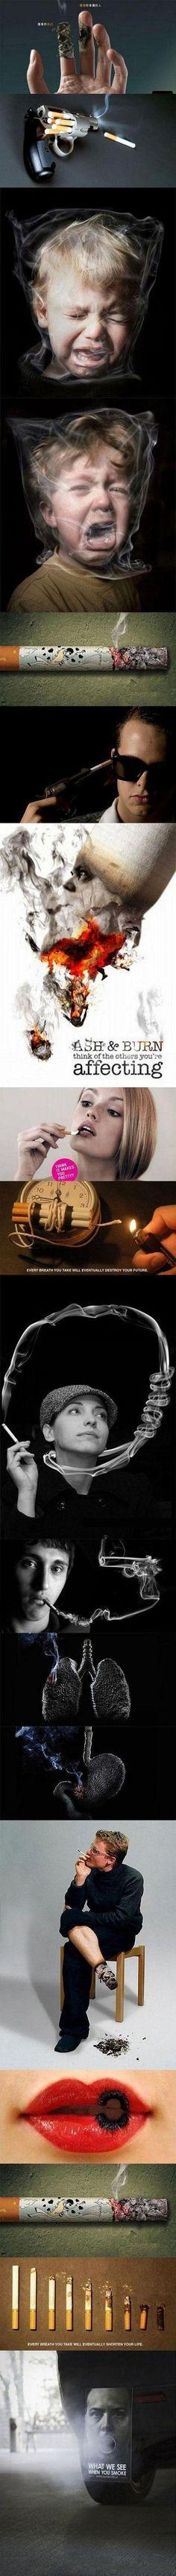 18 no smoking public service advertisings